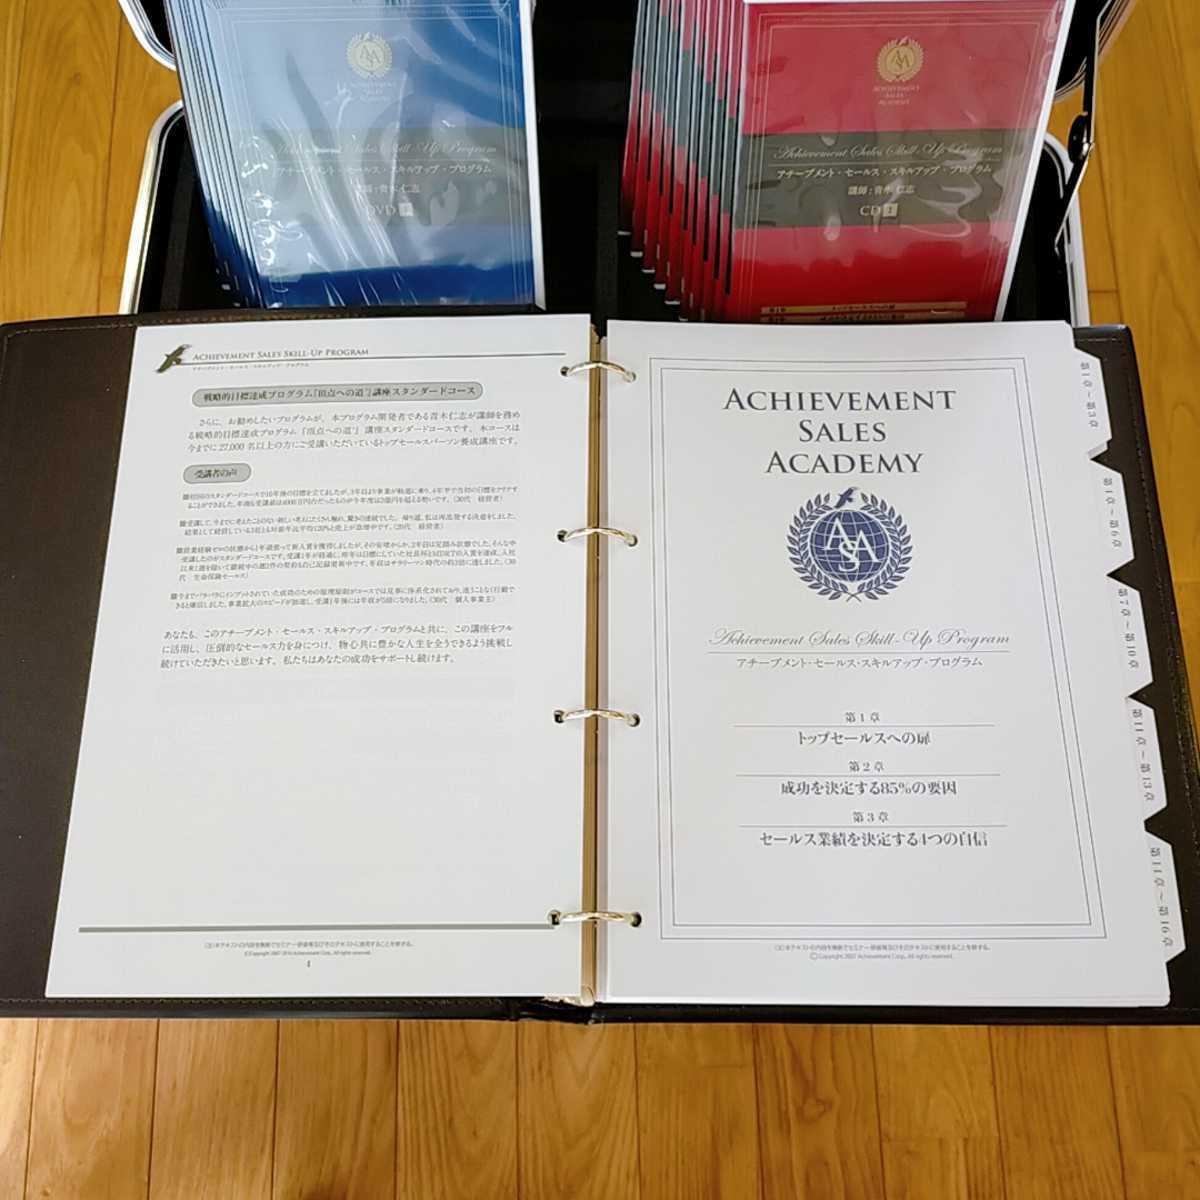 A6【未開封多数/送料無料】アチーブメント セールス スキルアップ プログラムCD&DVD 青木仁志 営業 販売